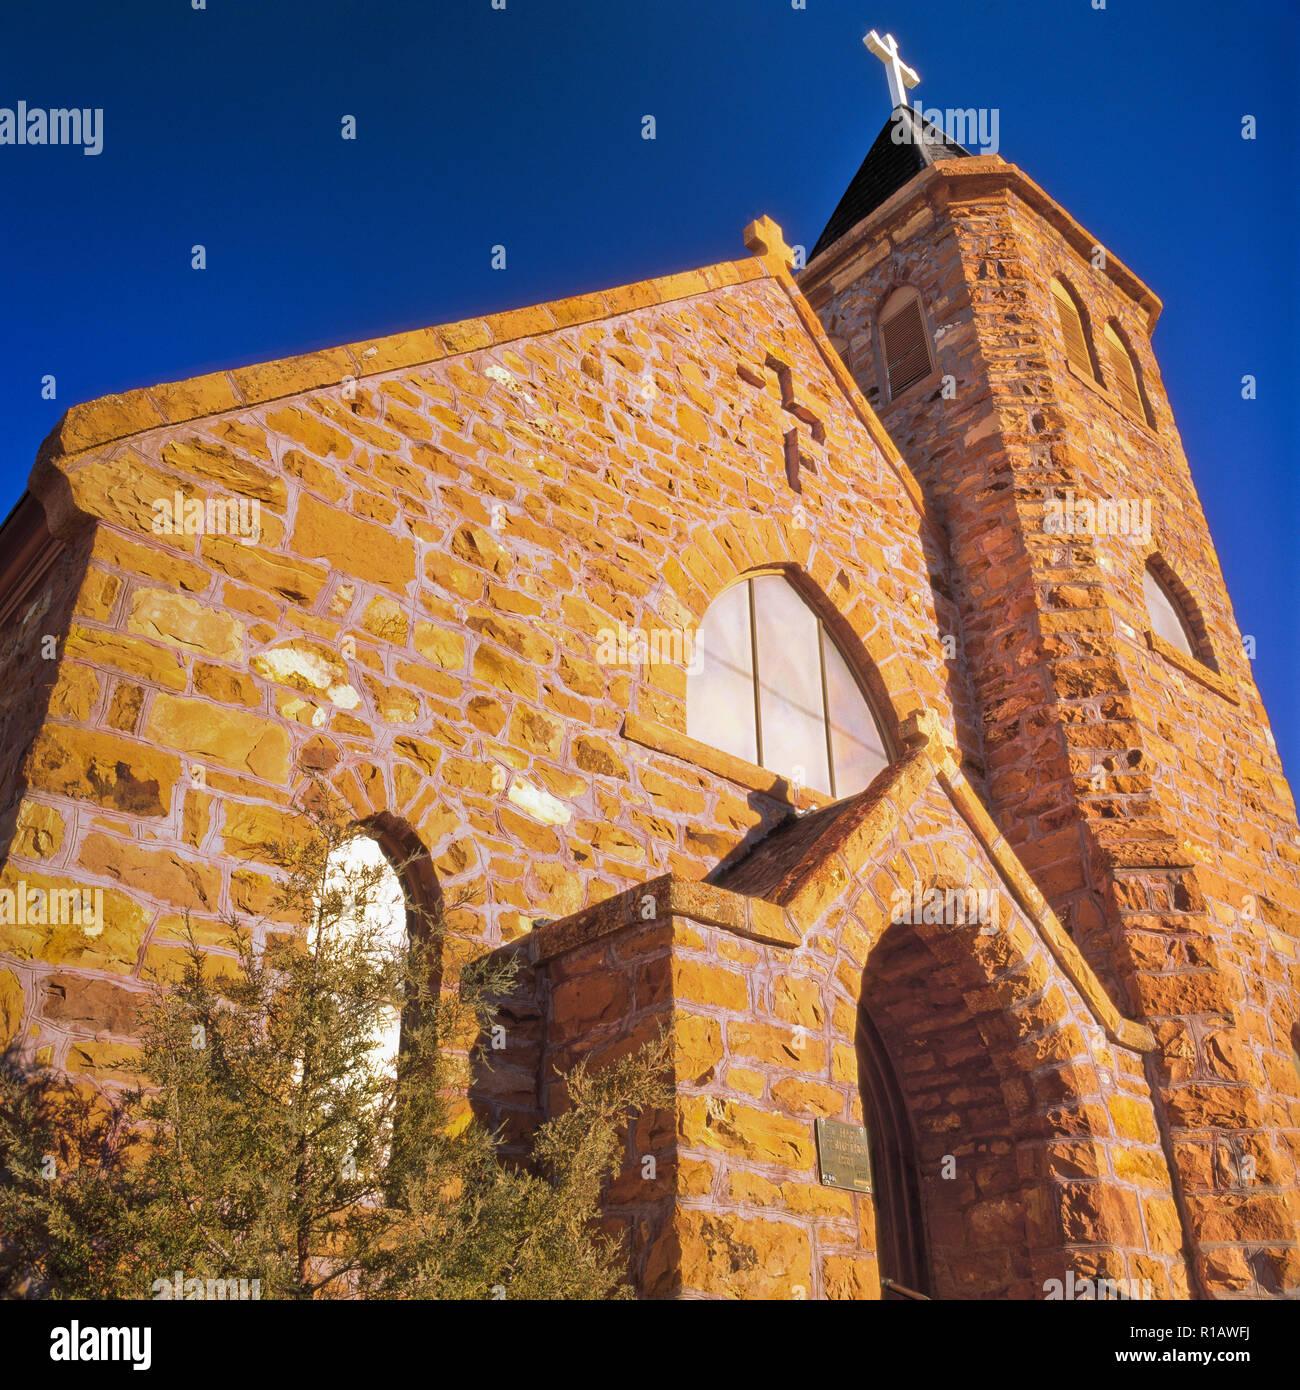 st. mary's catholic church at laurin, montana - Stock Image